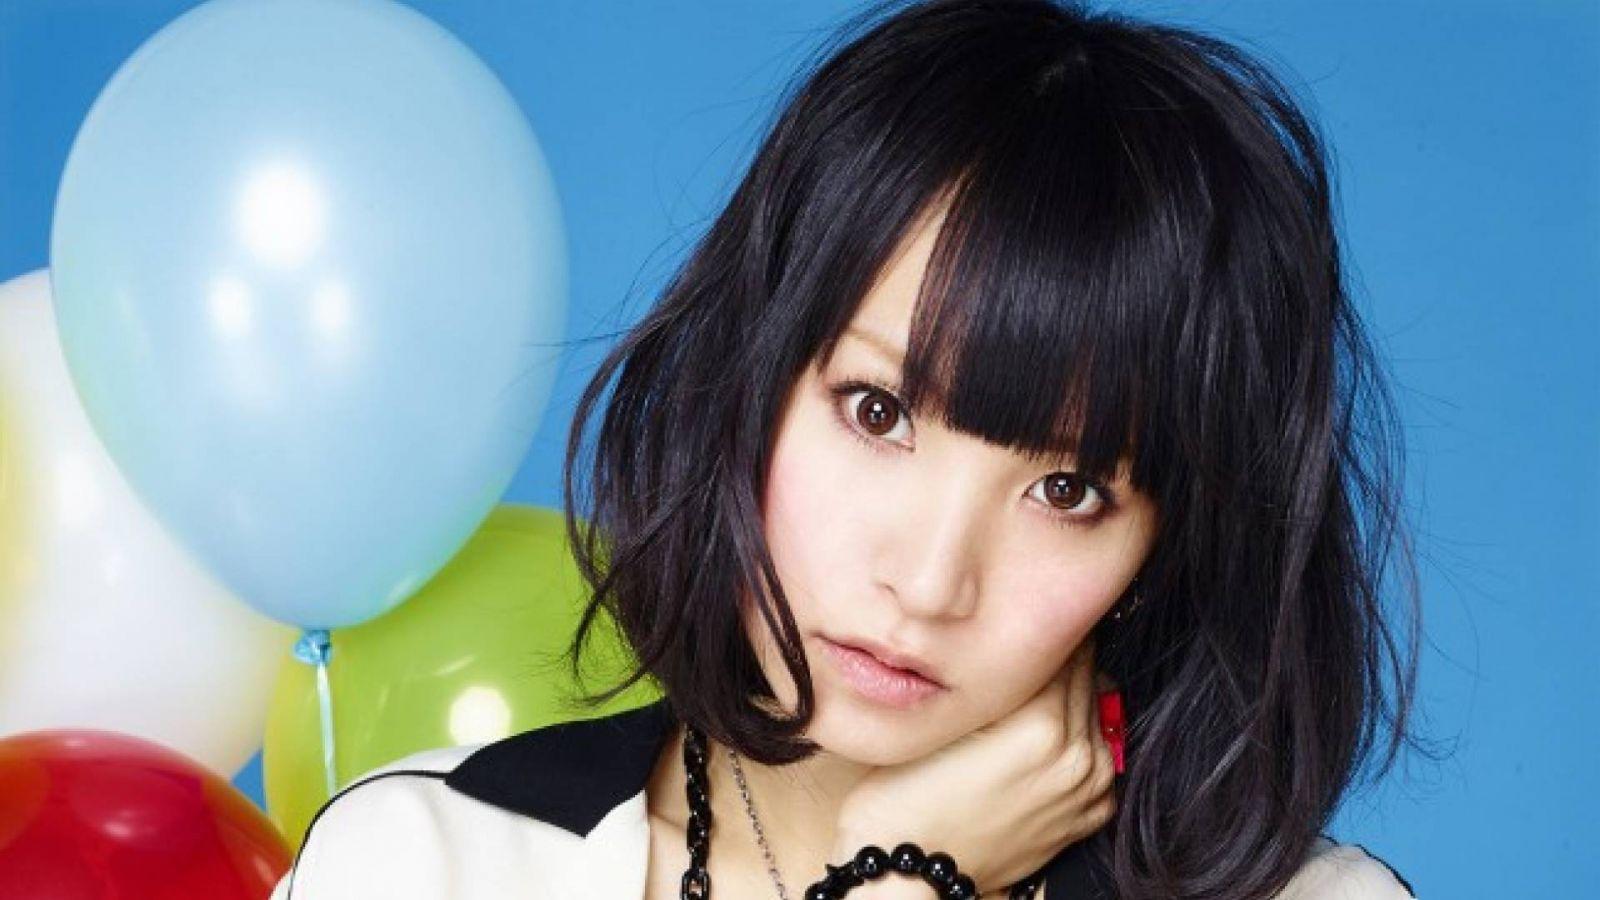 LiSA's Sixth Single © Sony Music Entertainment (Japan) Inc.